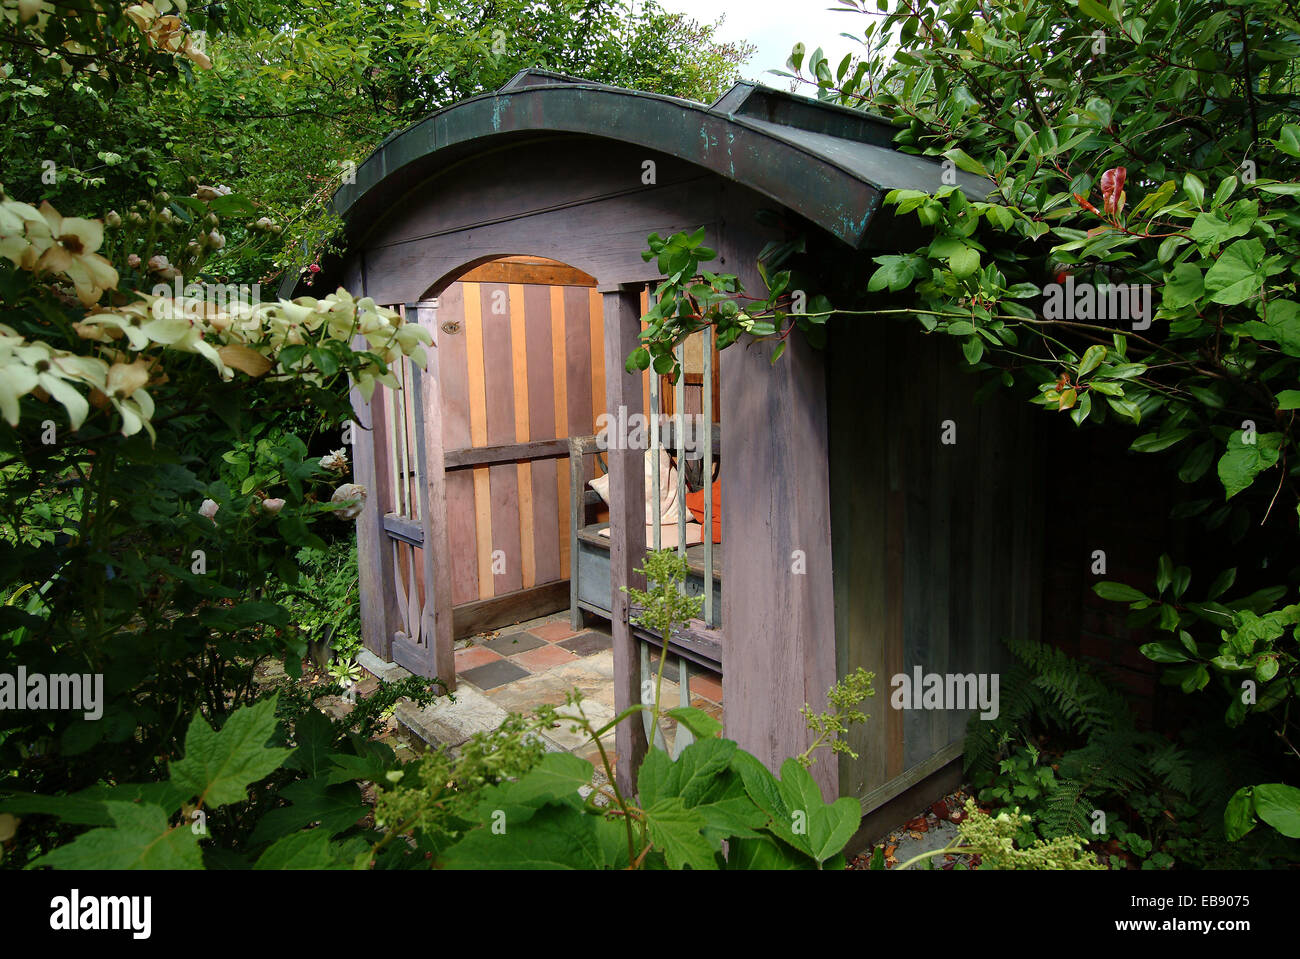 Summerhouse designed by Richard Craven in Ludlow, Shropshire, UK - Stock Image